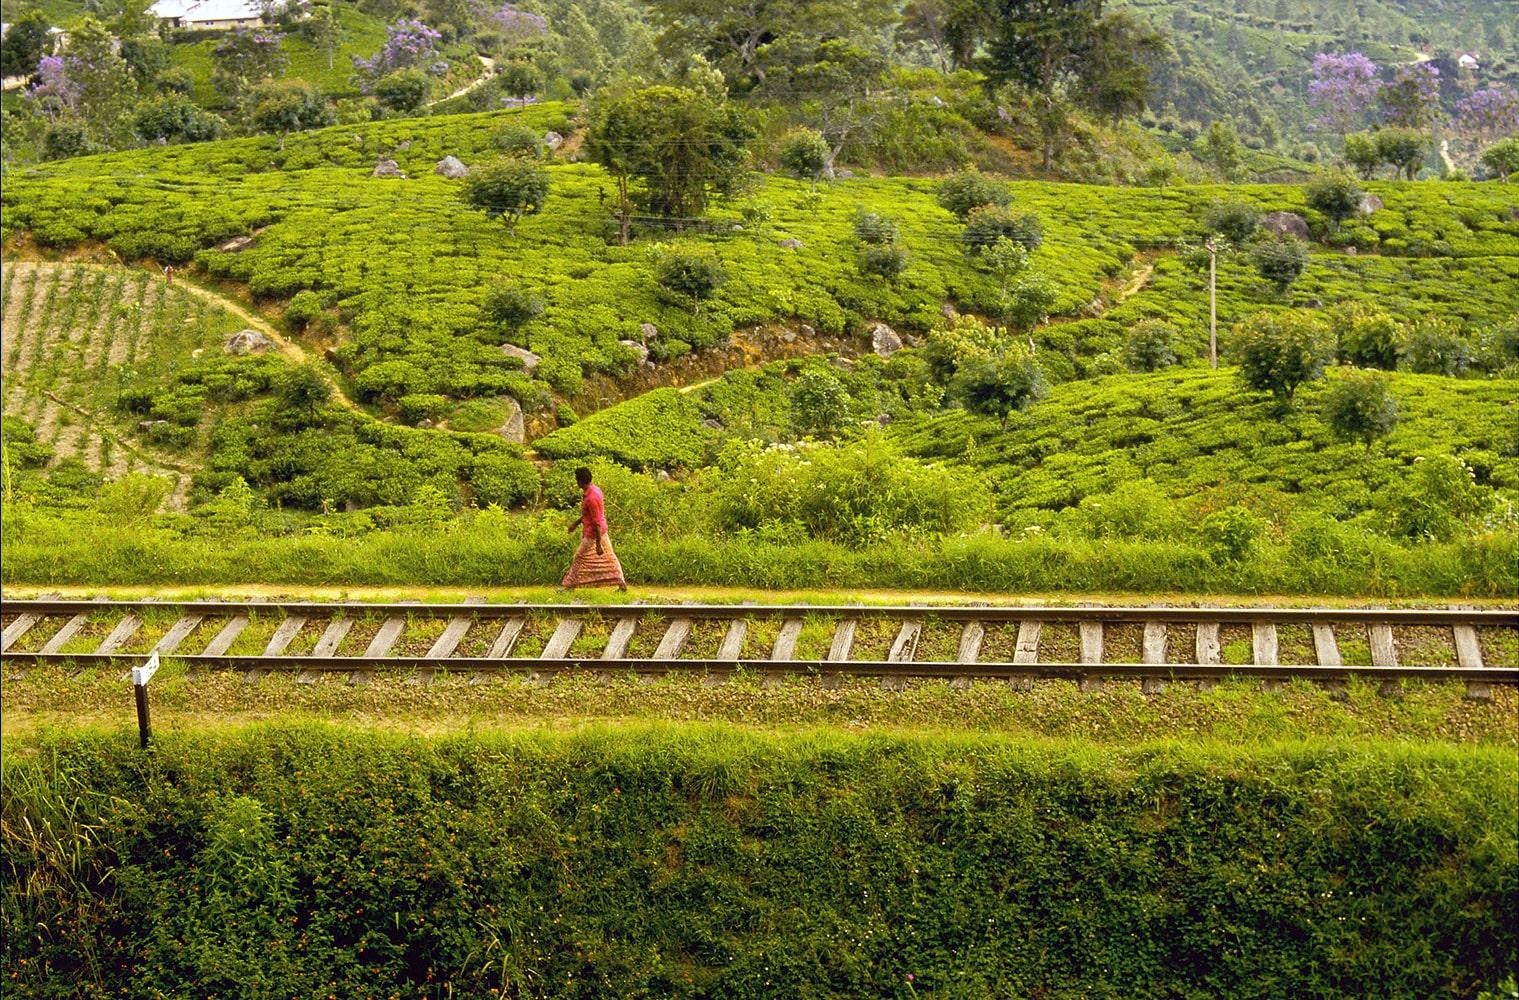 srilanka_plantationthe_1000h